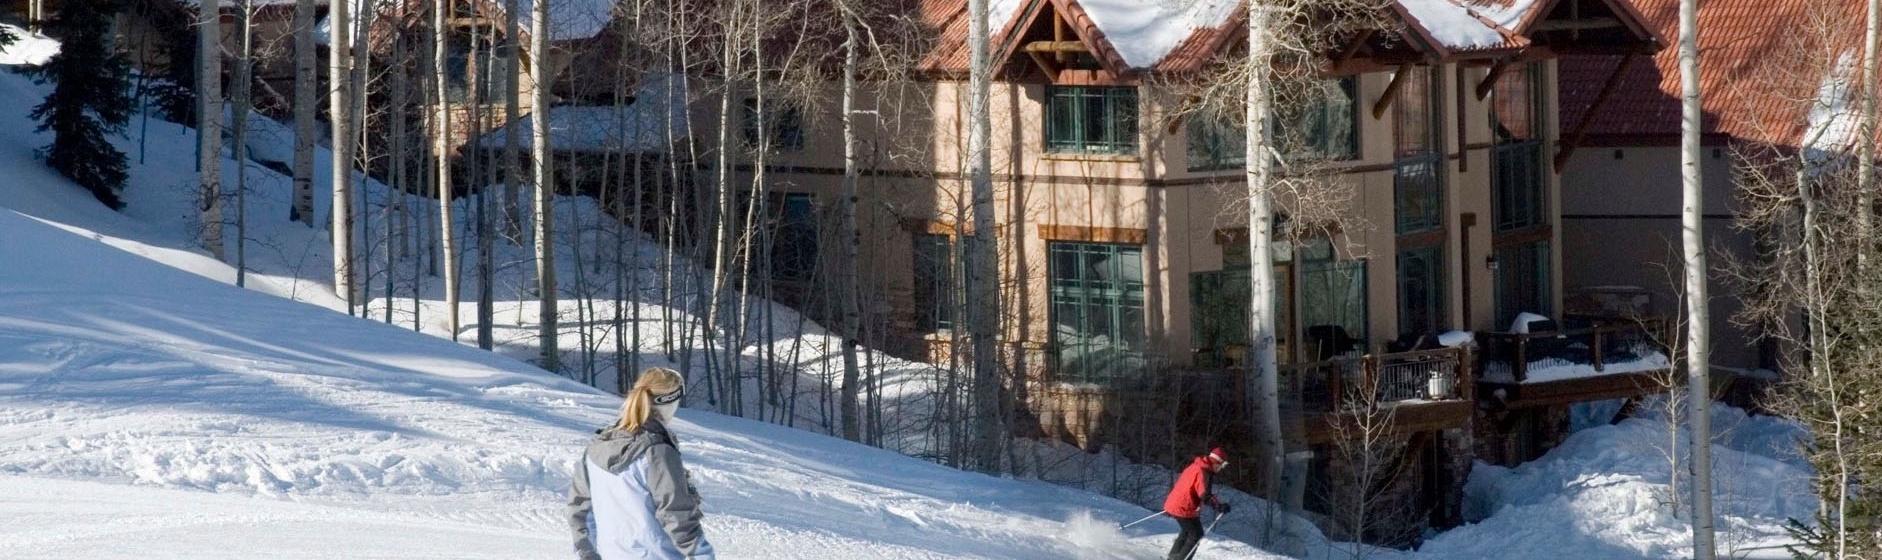 1-MountainVillage-PineMeadows138-SkiAccess-V12.jpg